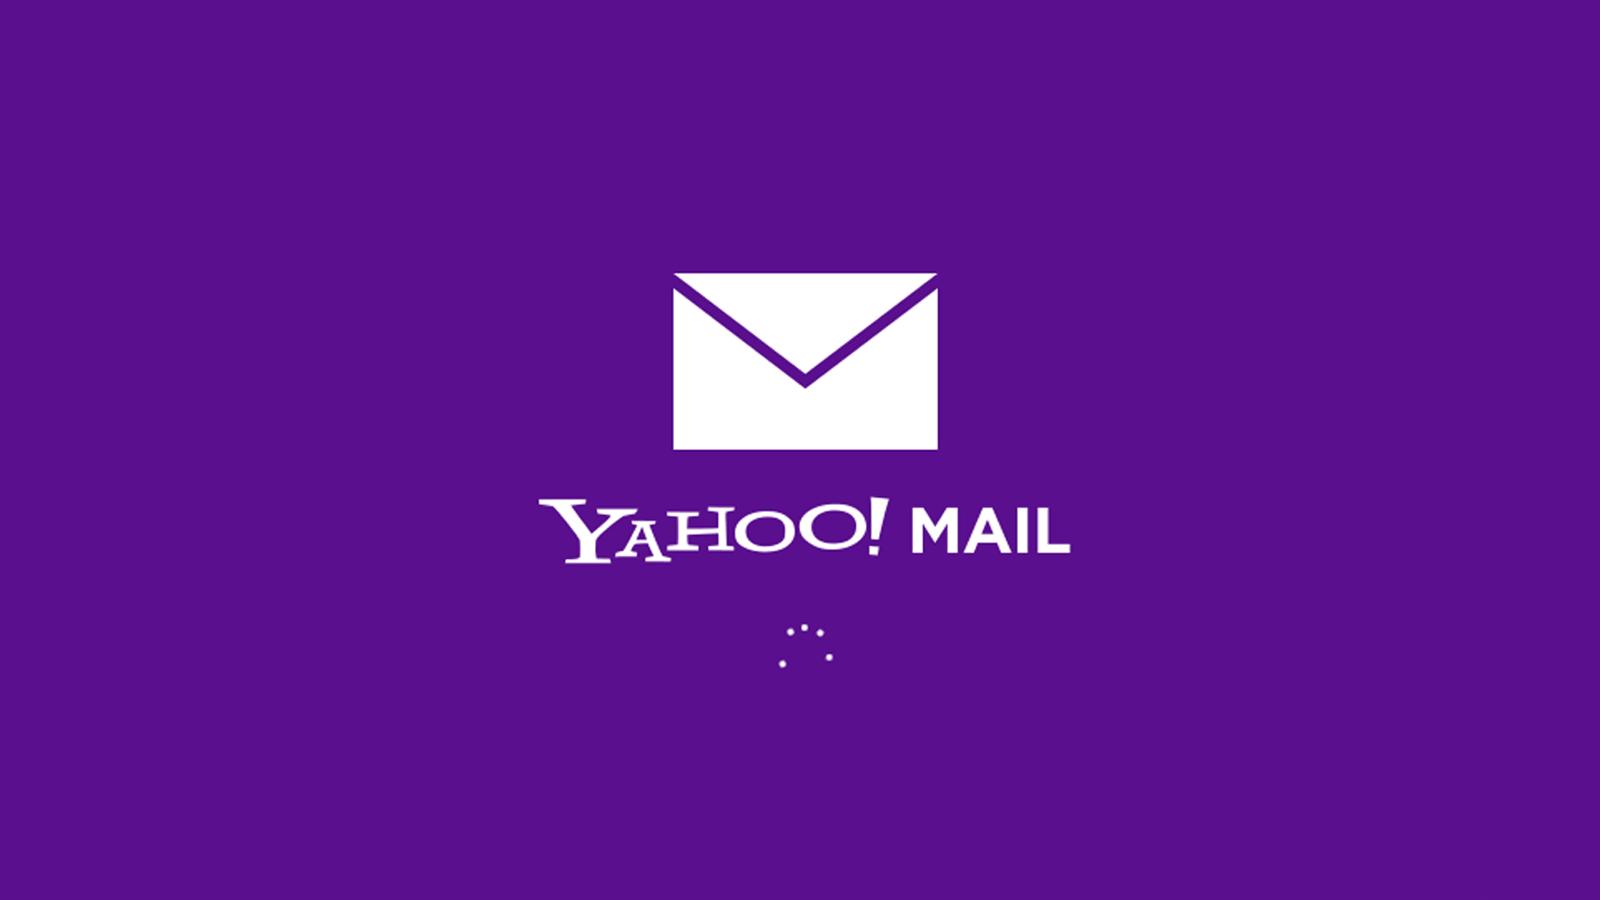 yahoo mail logo wallpaper 63930